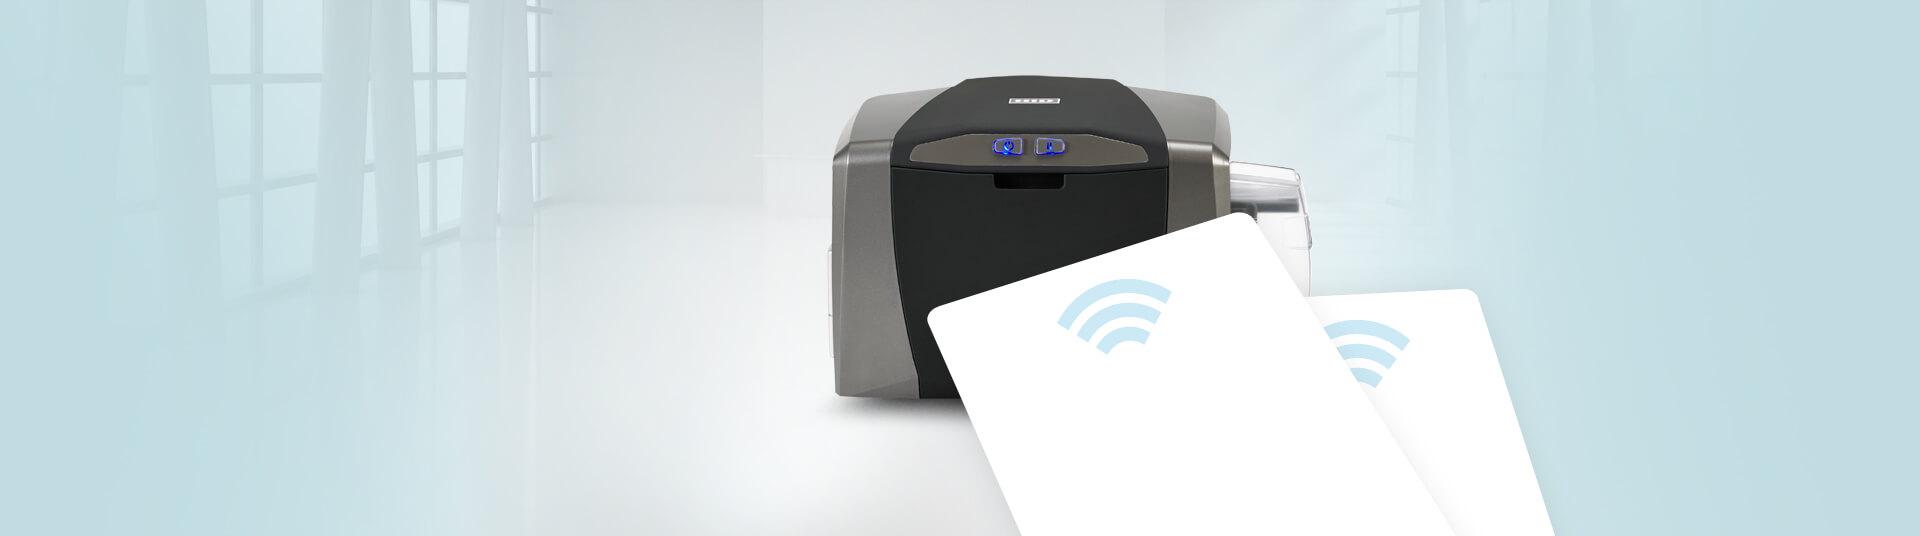 Proximity & RFID Card Systems